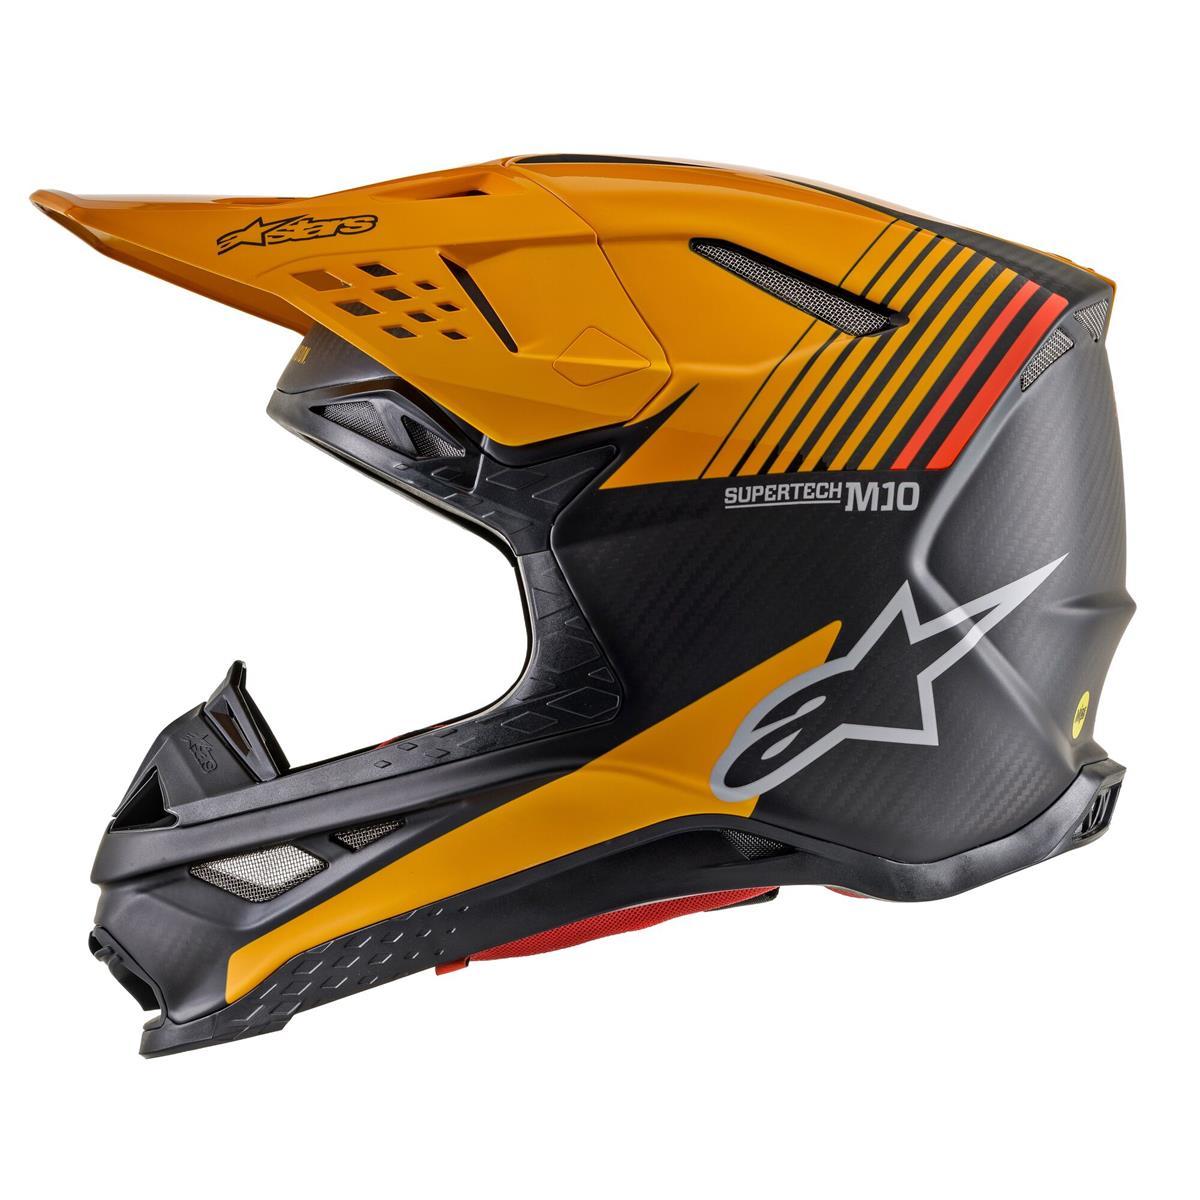 alpinestars-mx-helm-mx-helmet-supertech-s-m10-4